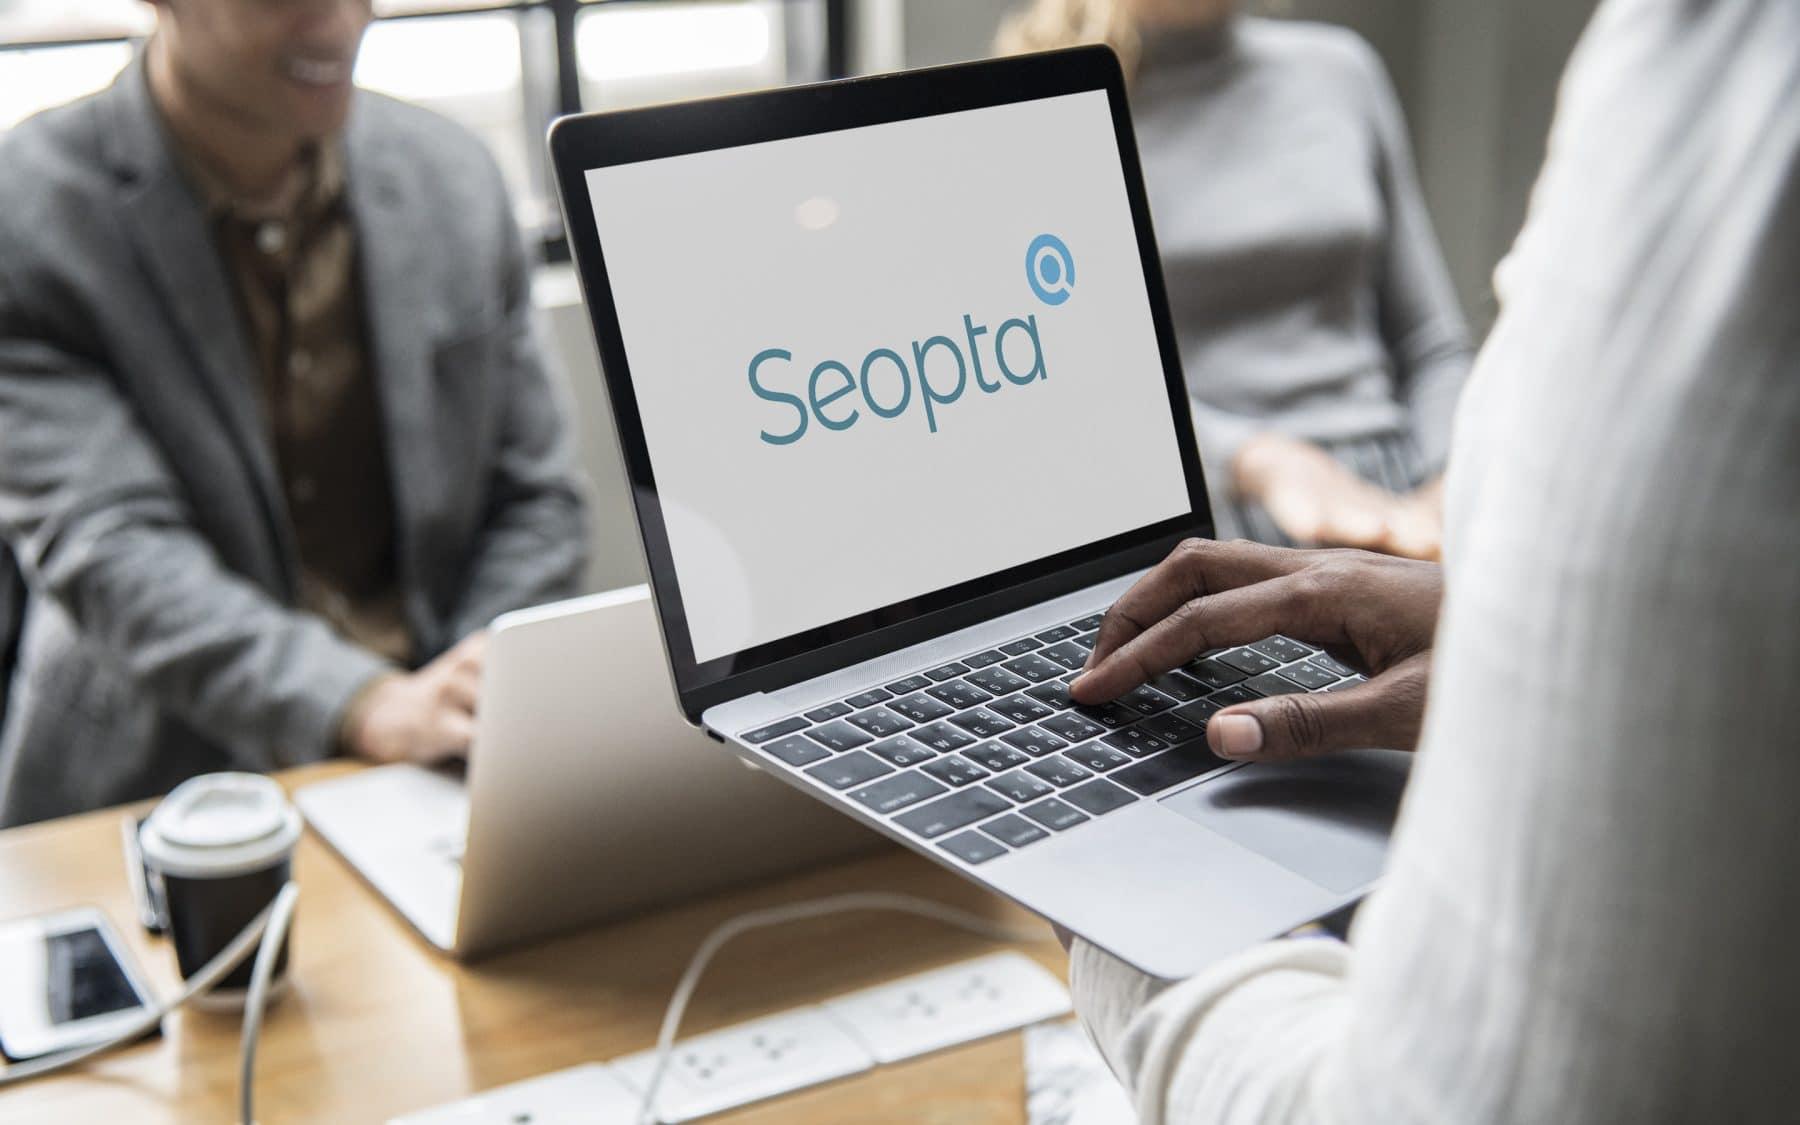 Seopta 2